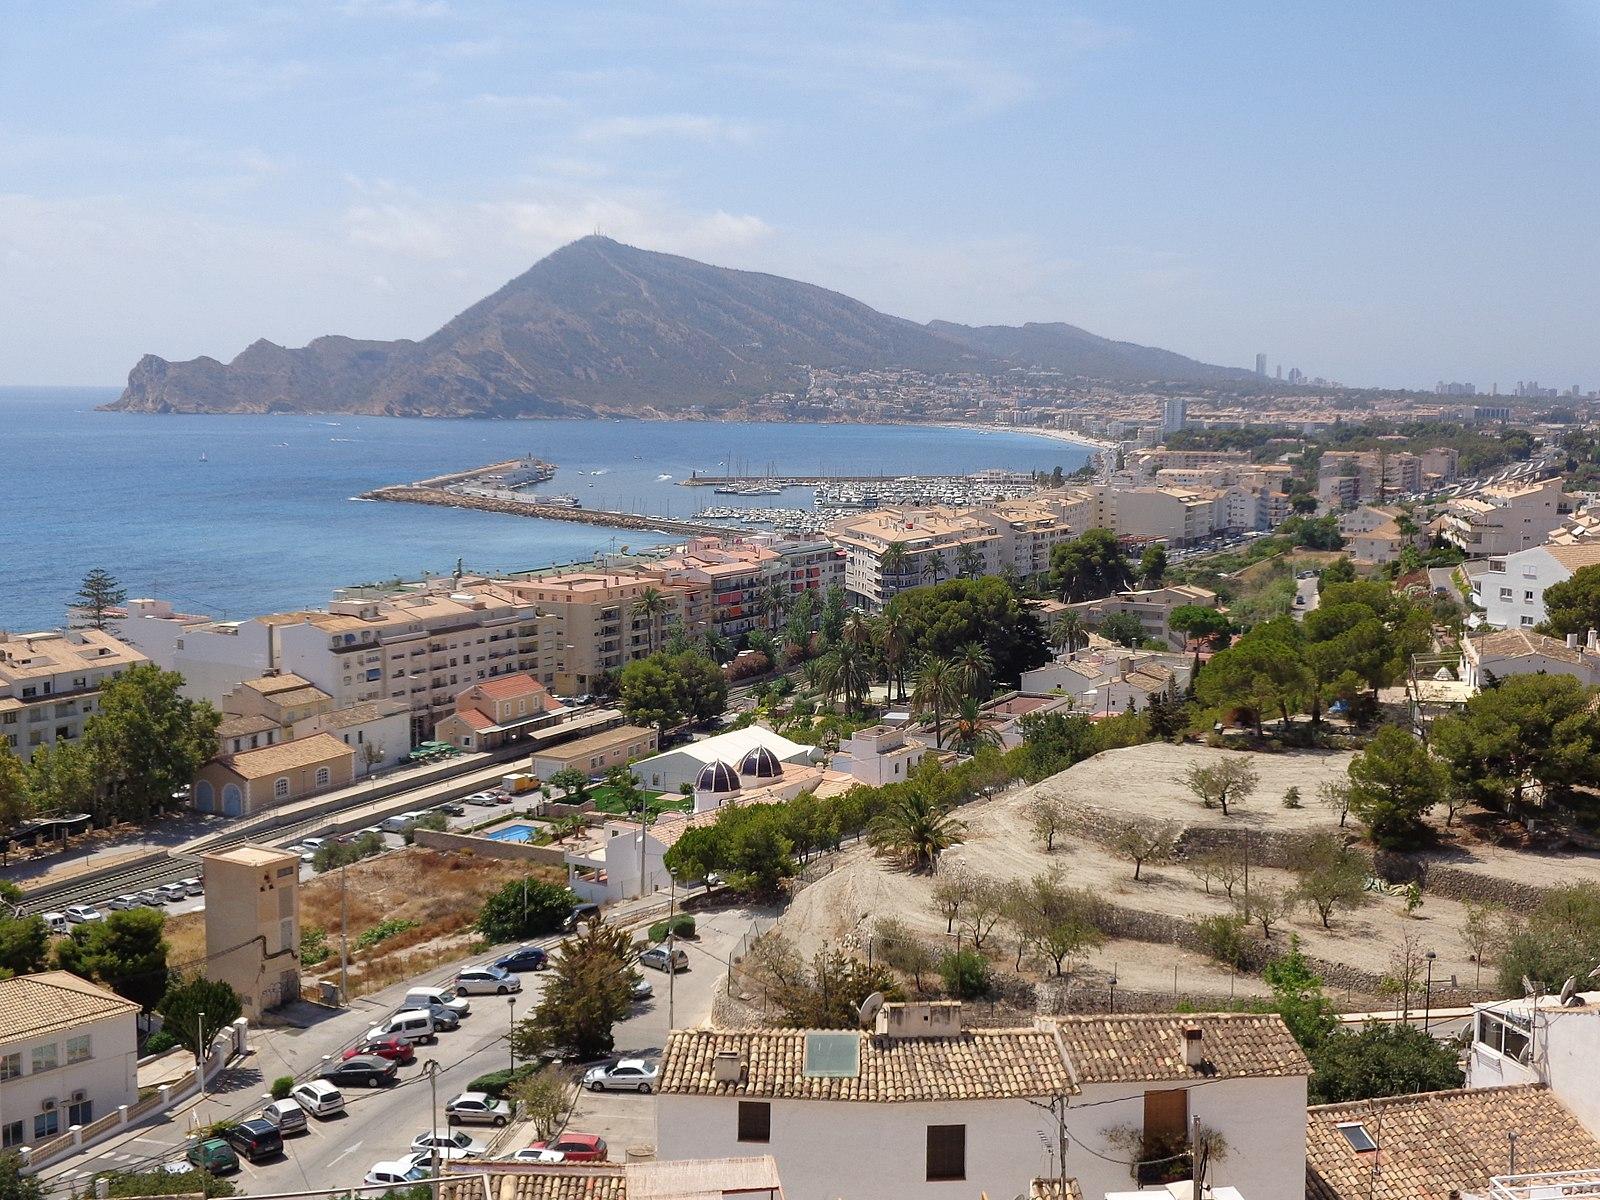 Arquitectos Altea. Arquitectos Alicante. Arquitectos Costa Blanca.